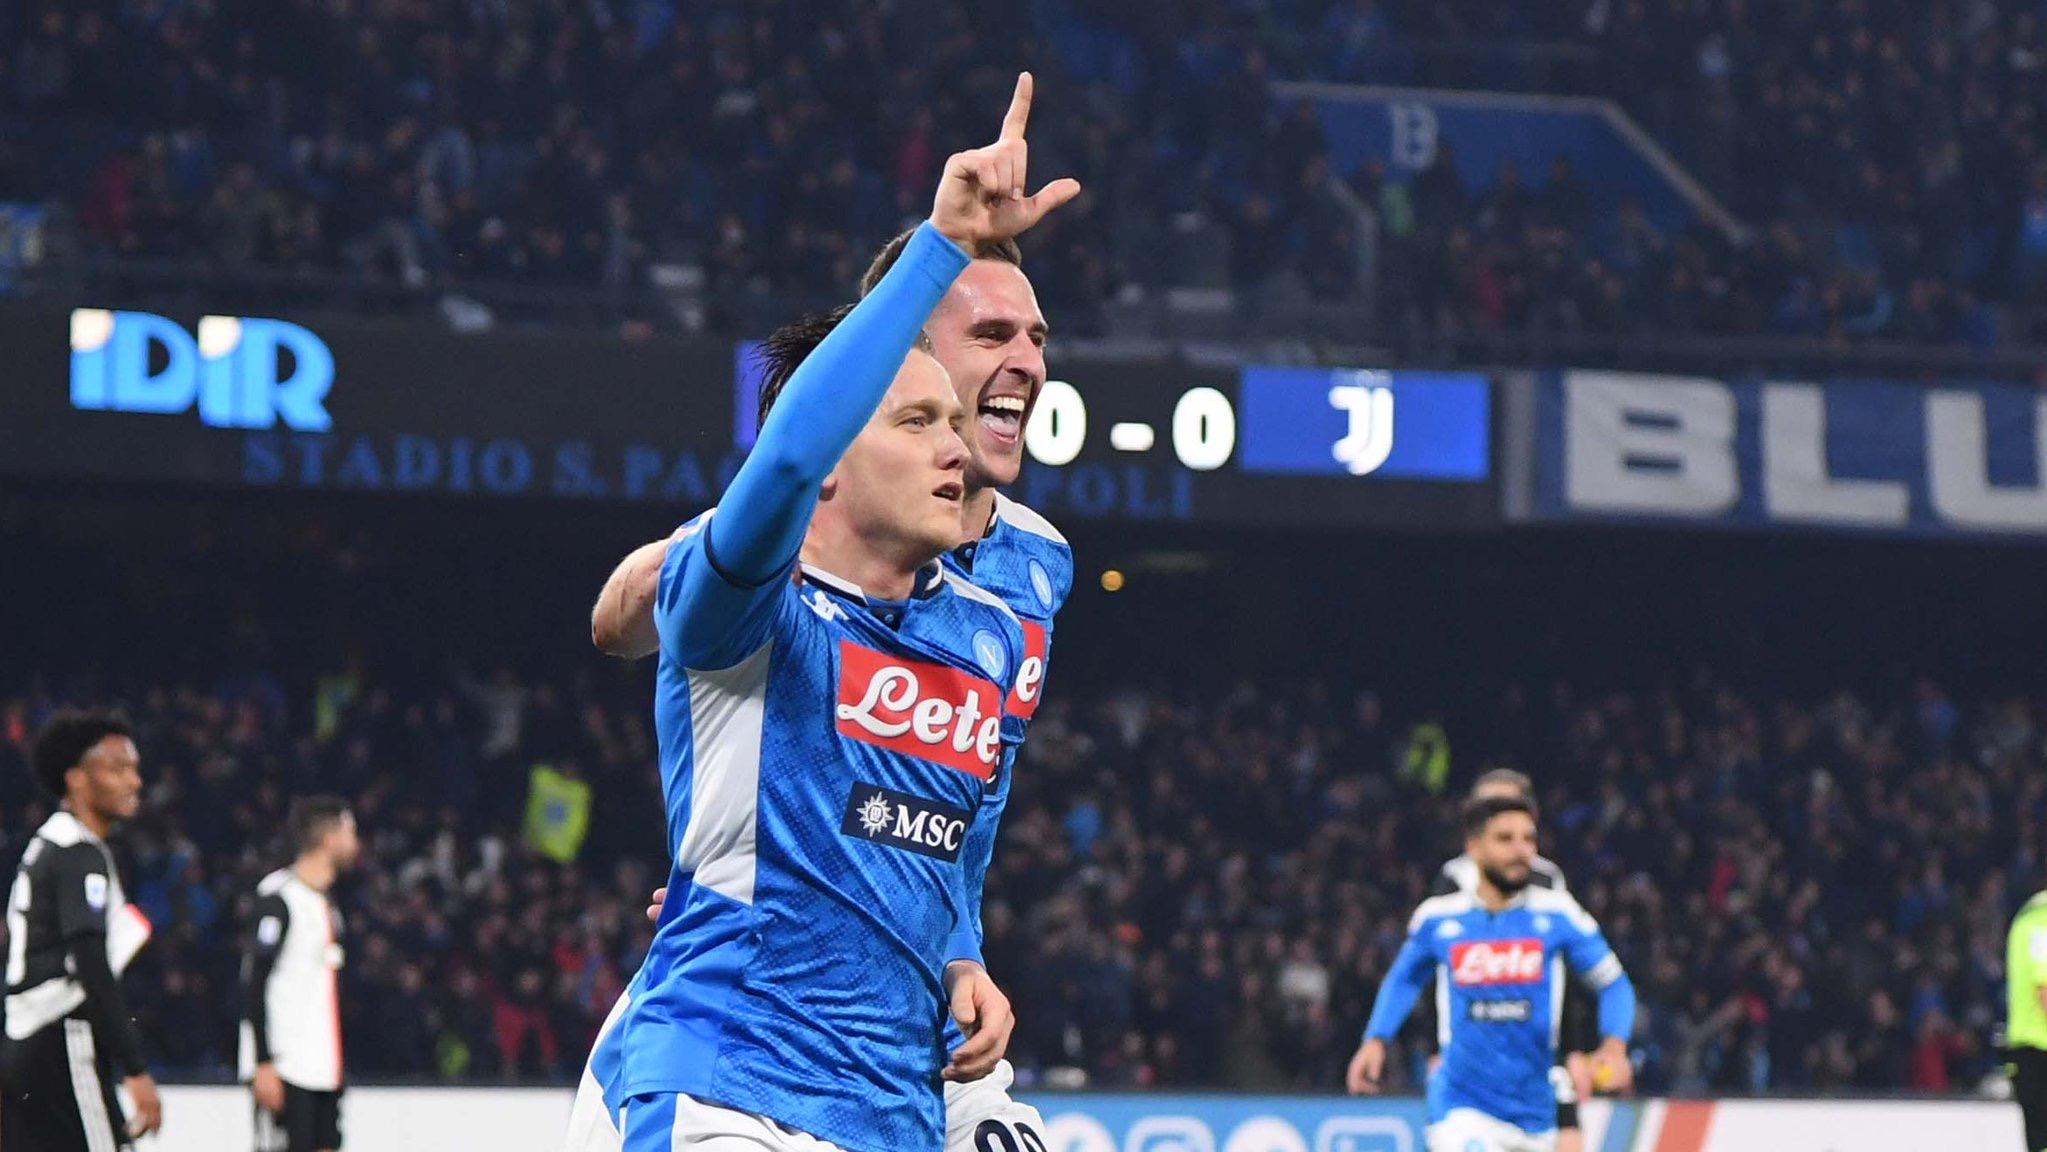 Photo of Cristiano no pudo impedir la derrota de la Juve frente al Napoli